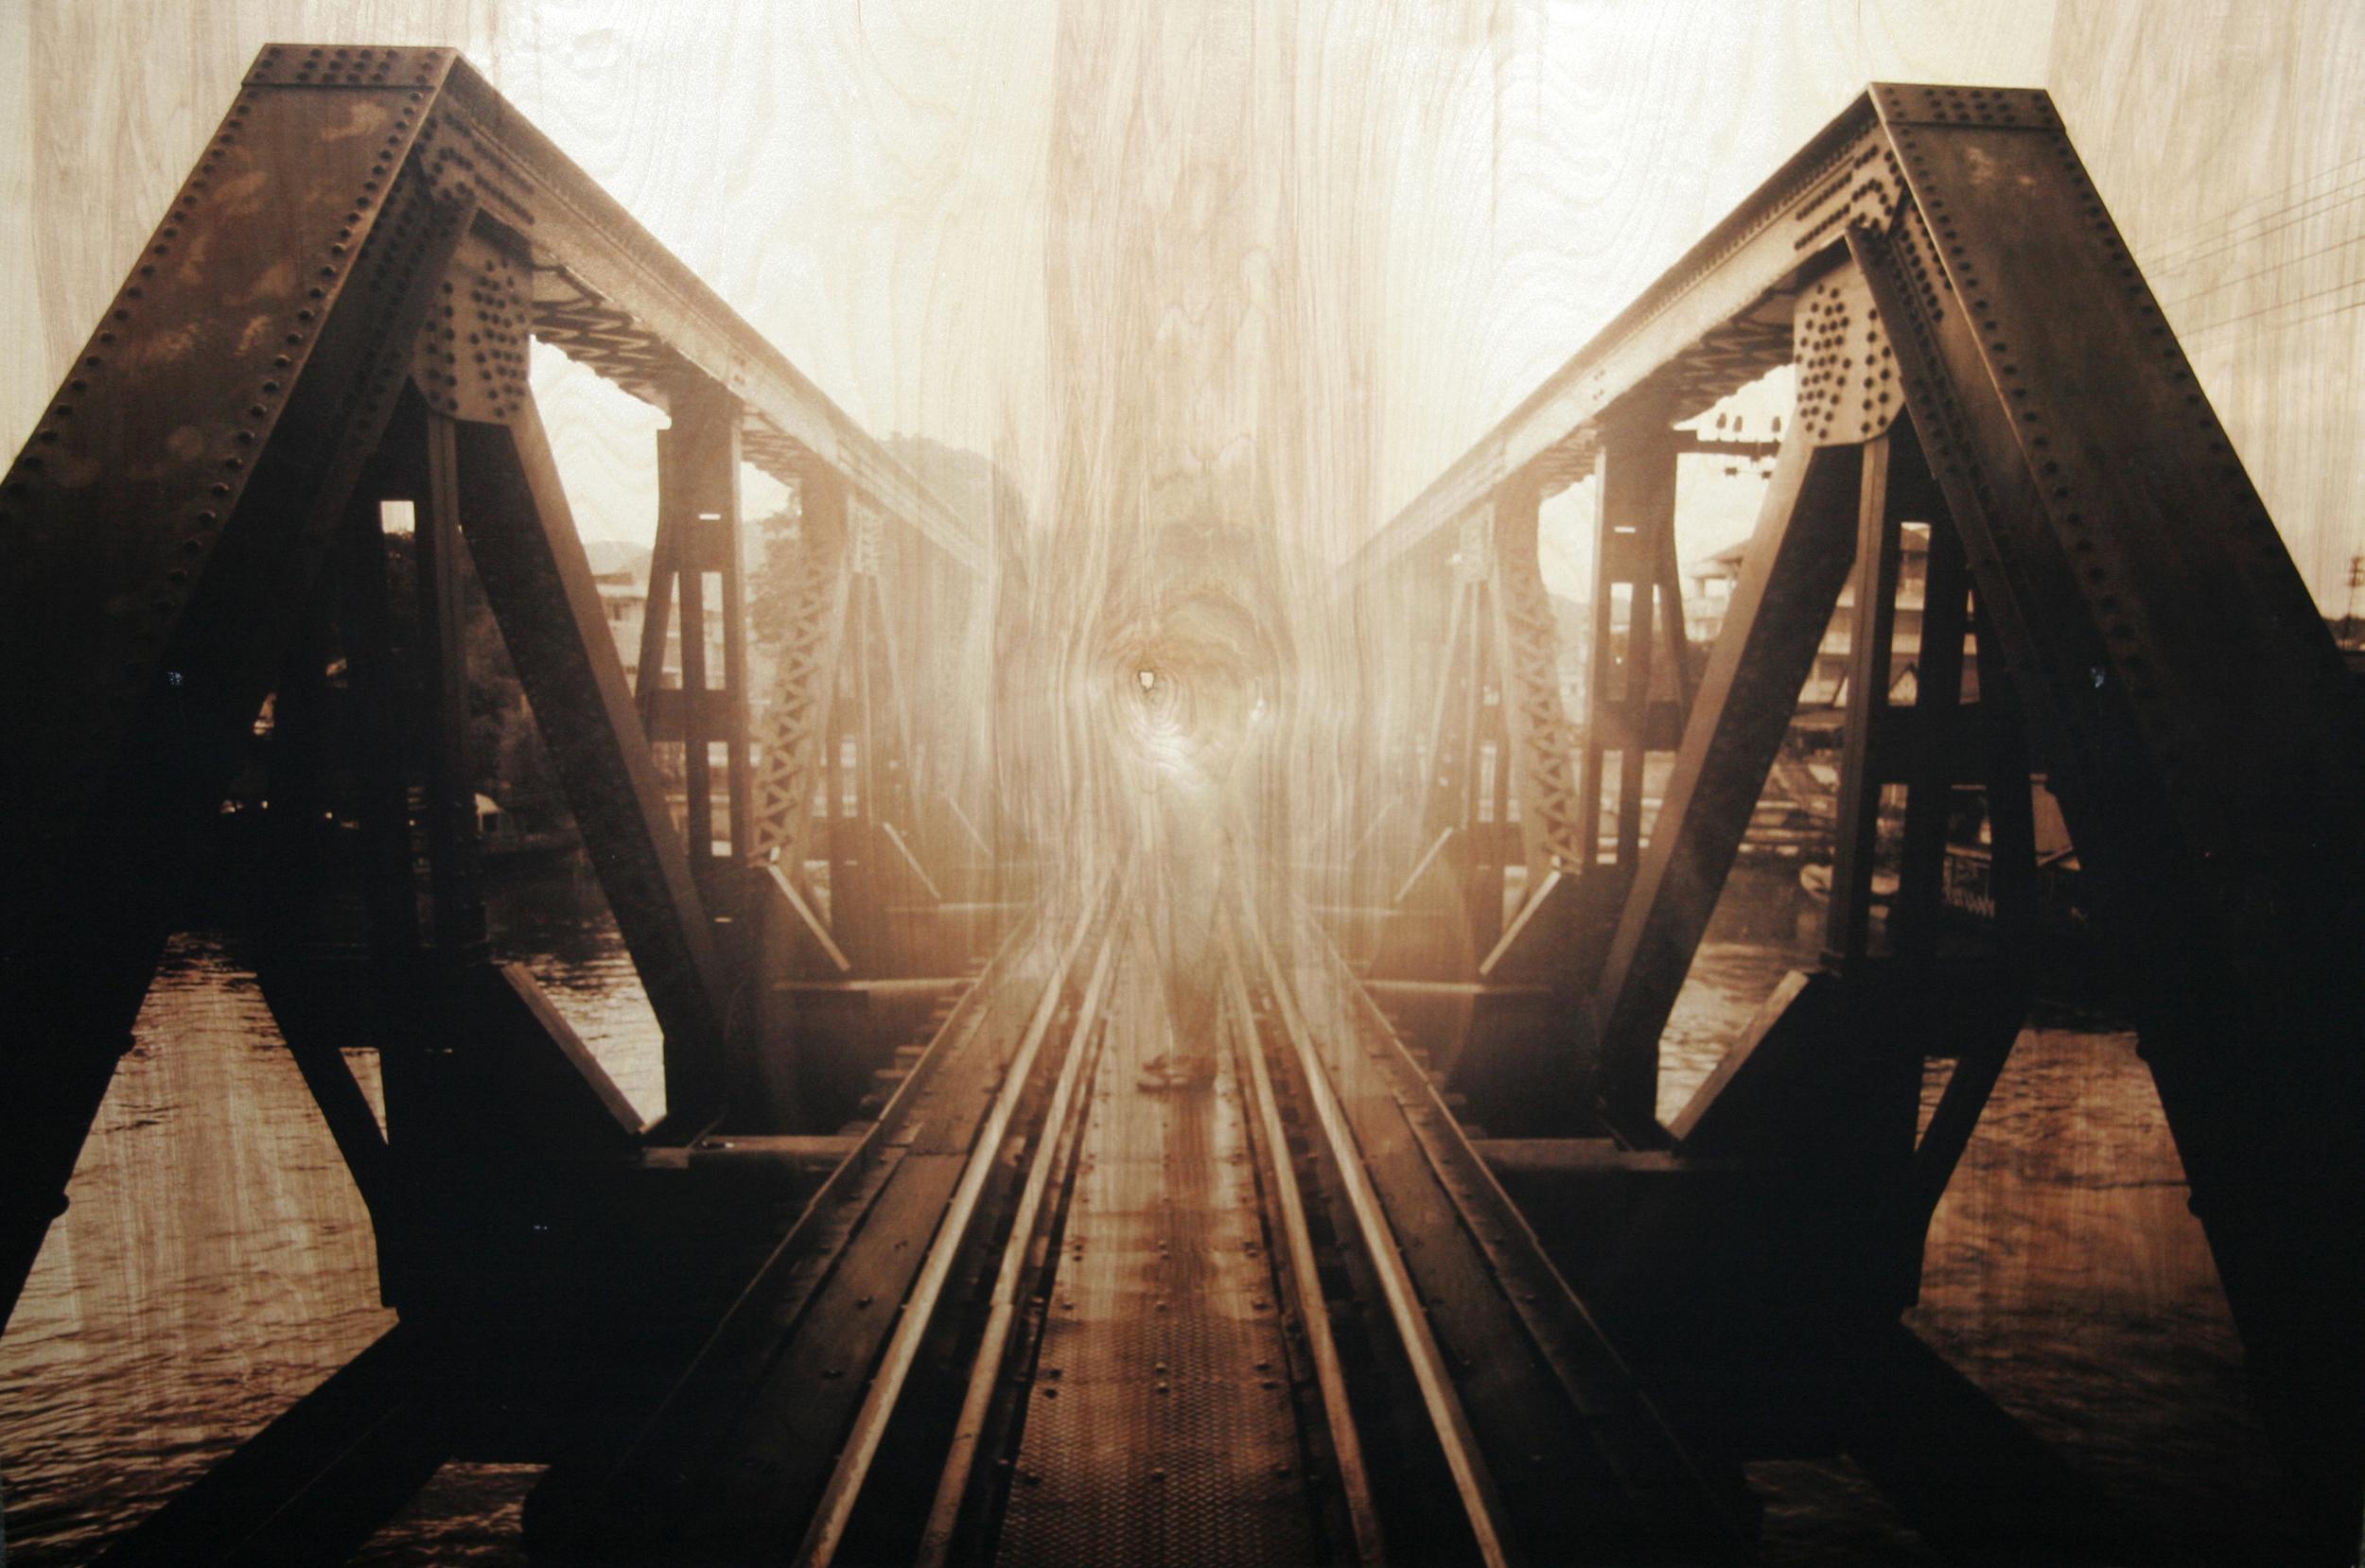 Crossing Bridges, Edition of 12,  2013 - 2015 c print on reclaimed wood floor 32 x 48 x 1.5 in / 81 x 122 x 4 cm